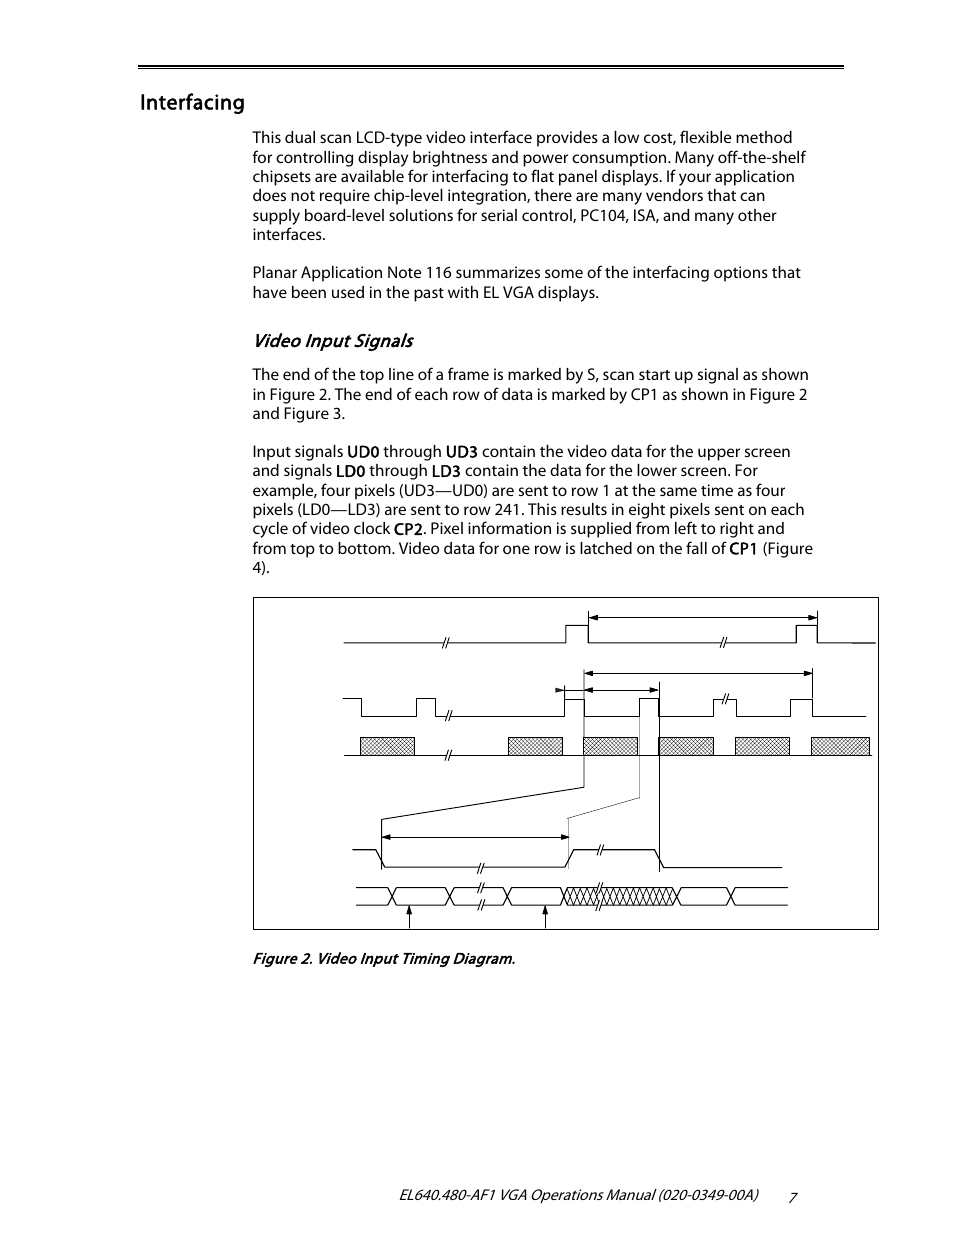 medium resolution of interfacing video input signals planar el640 480 af1 user manual page 9 17